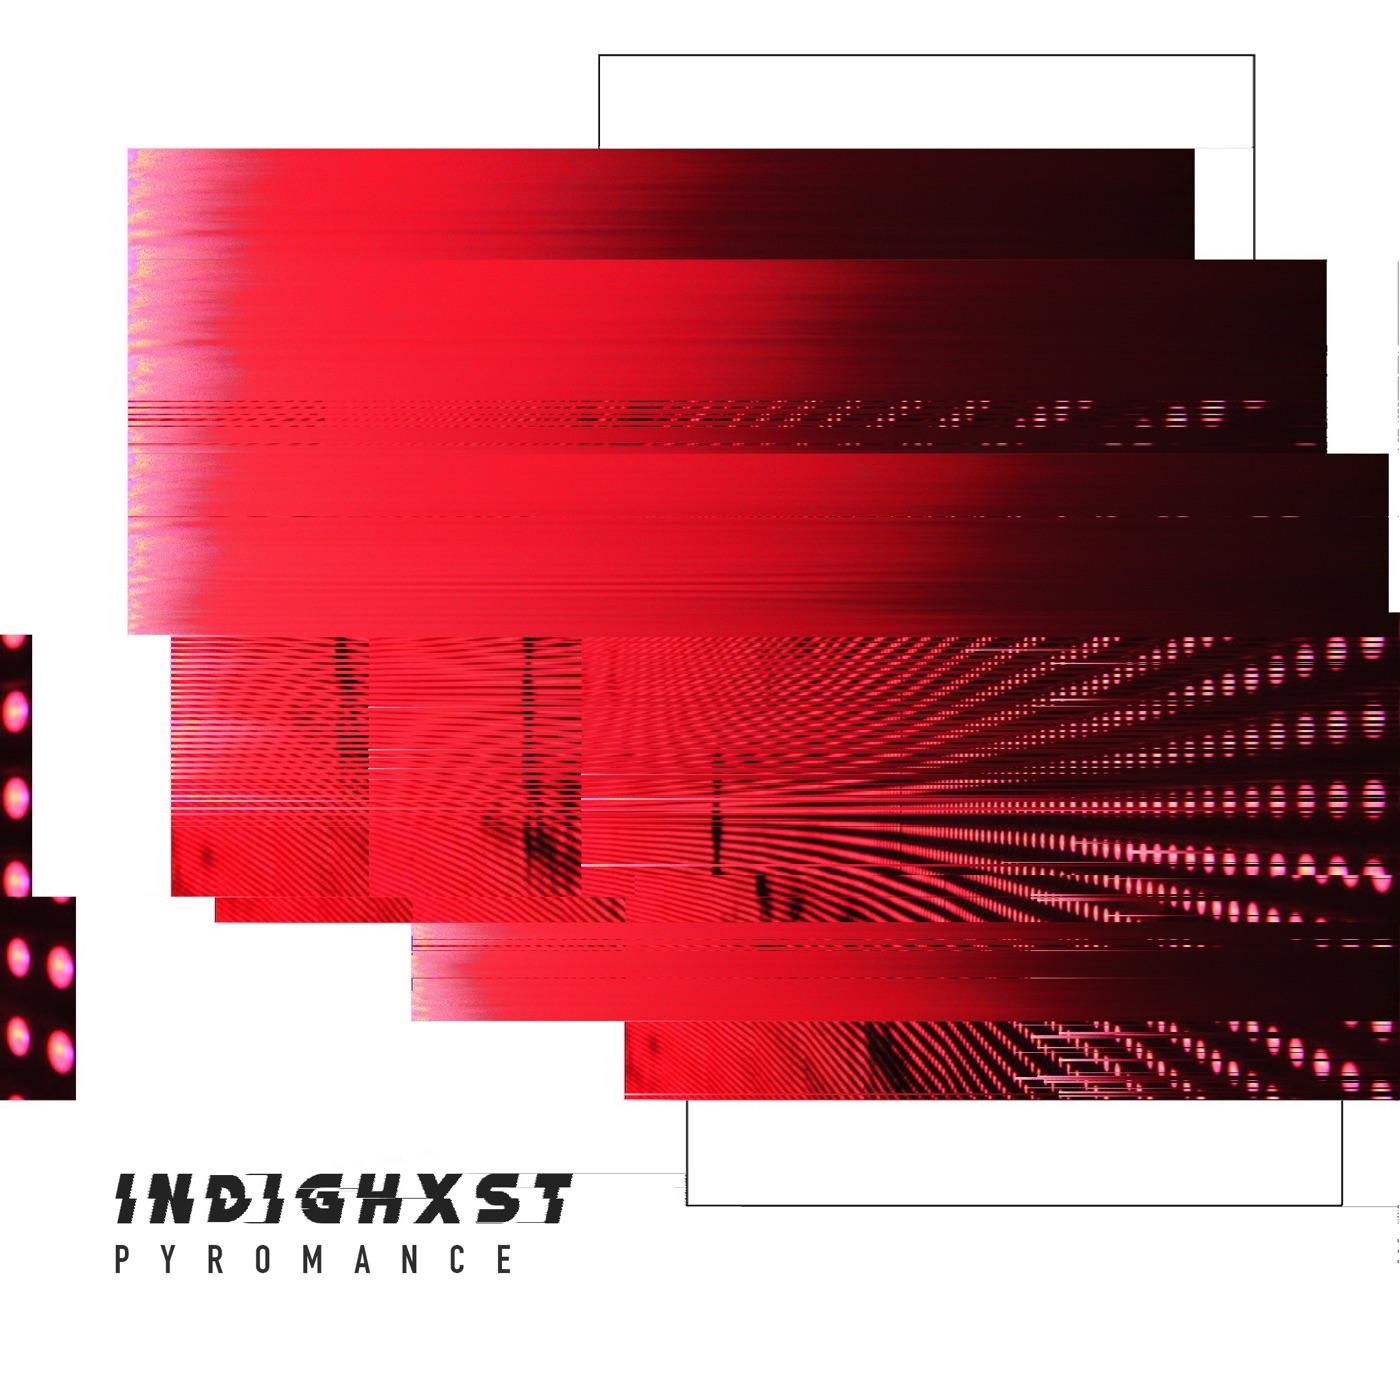 Indighxst - Pyromance [single] (2019)